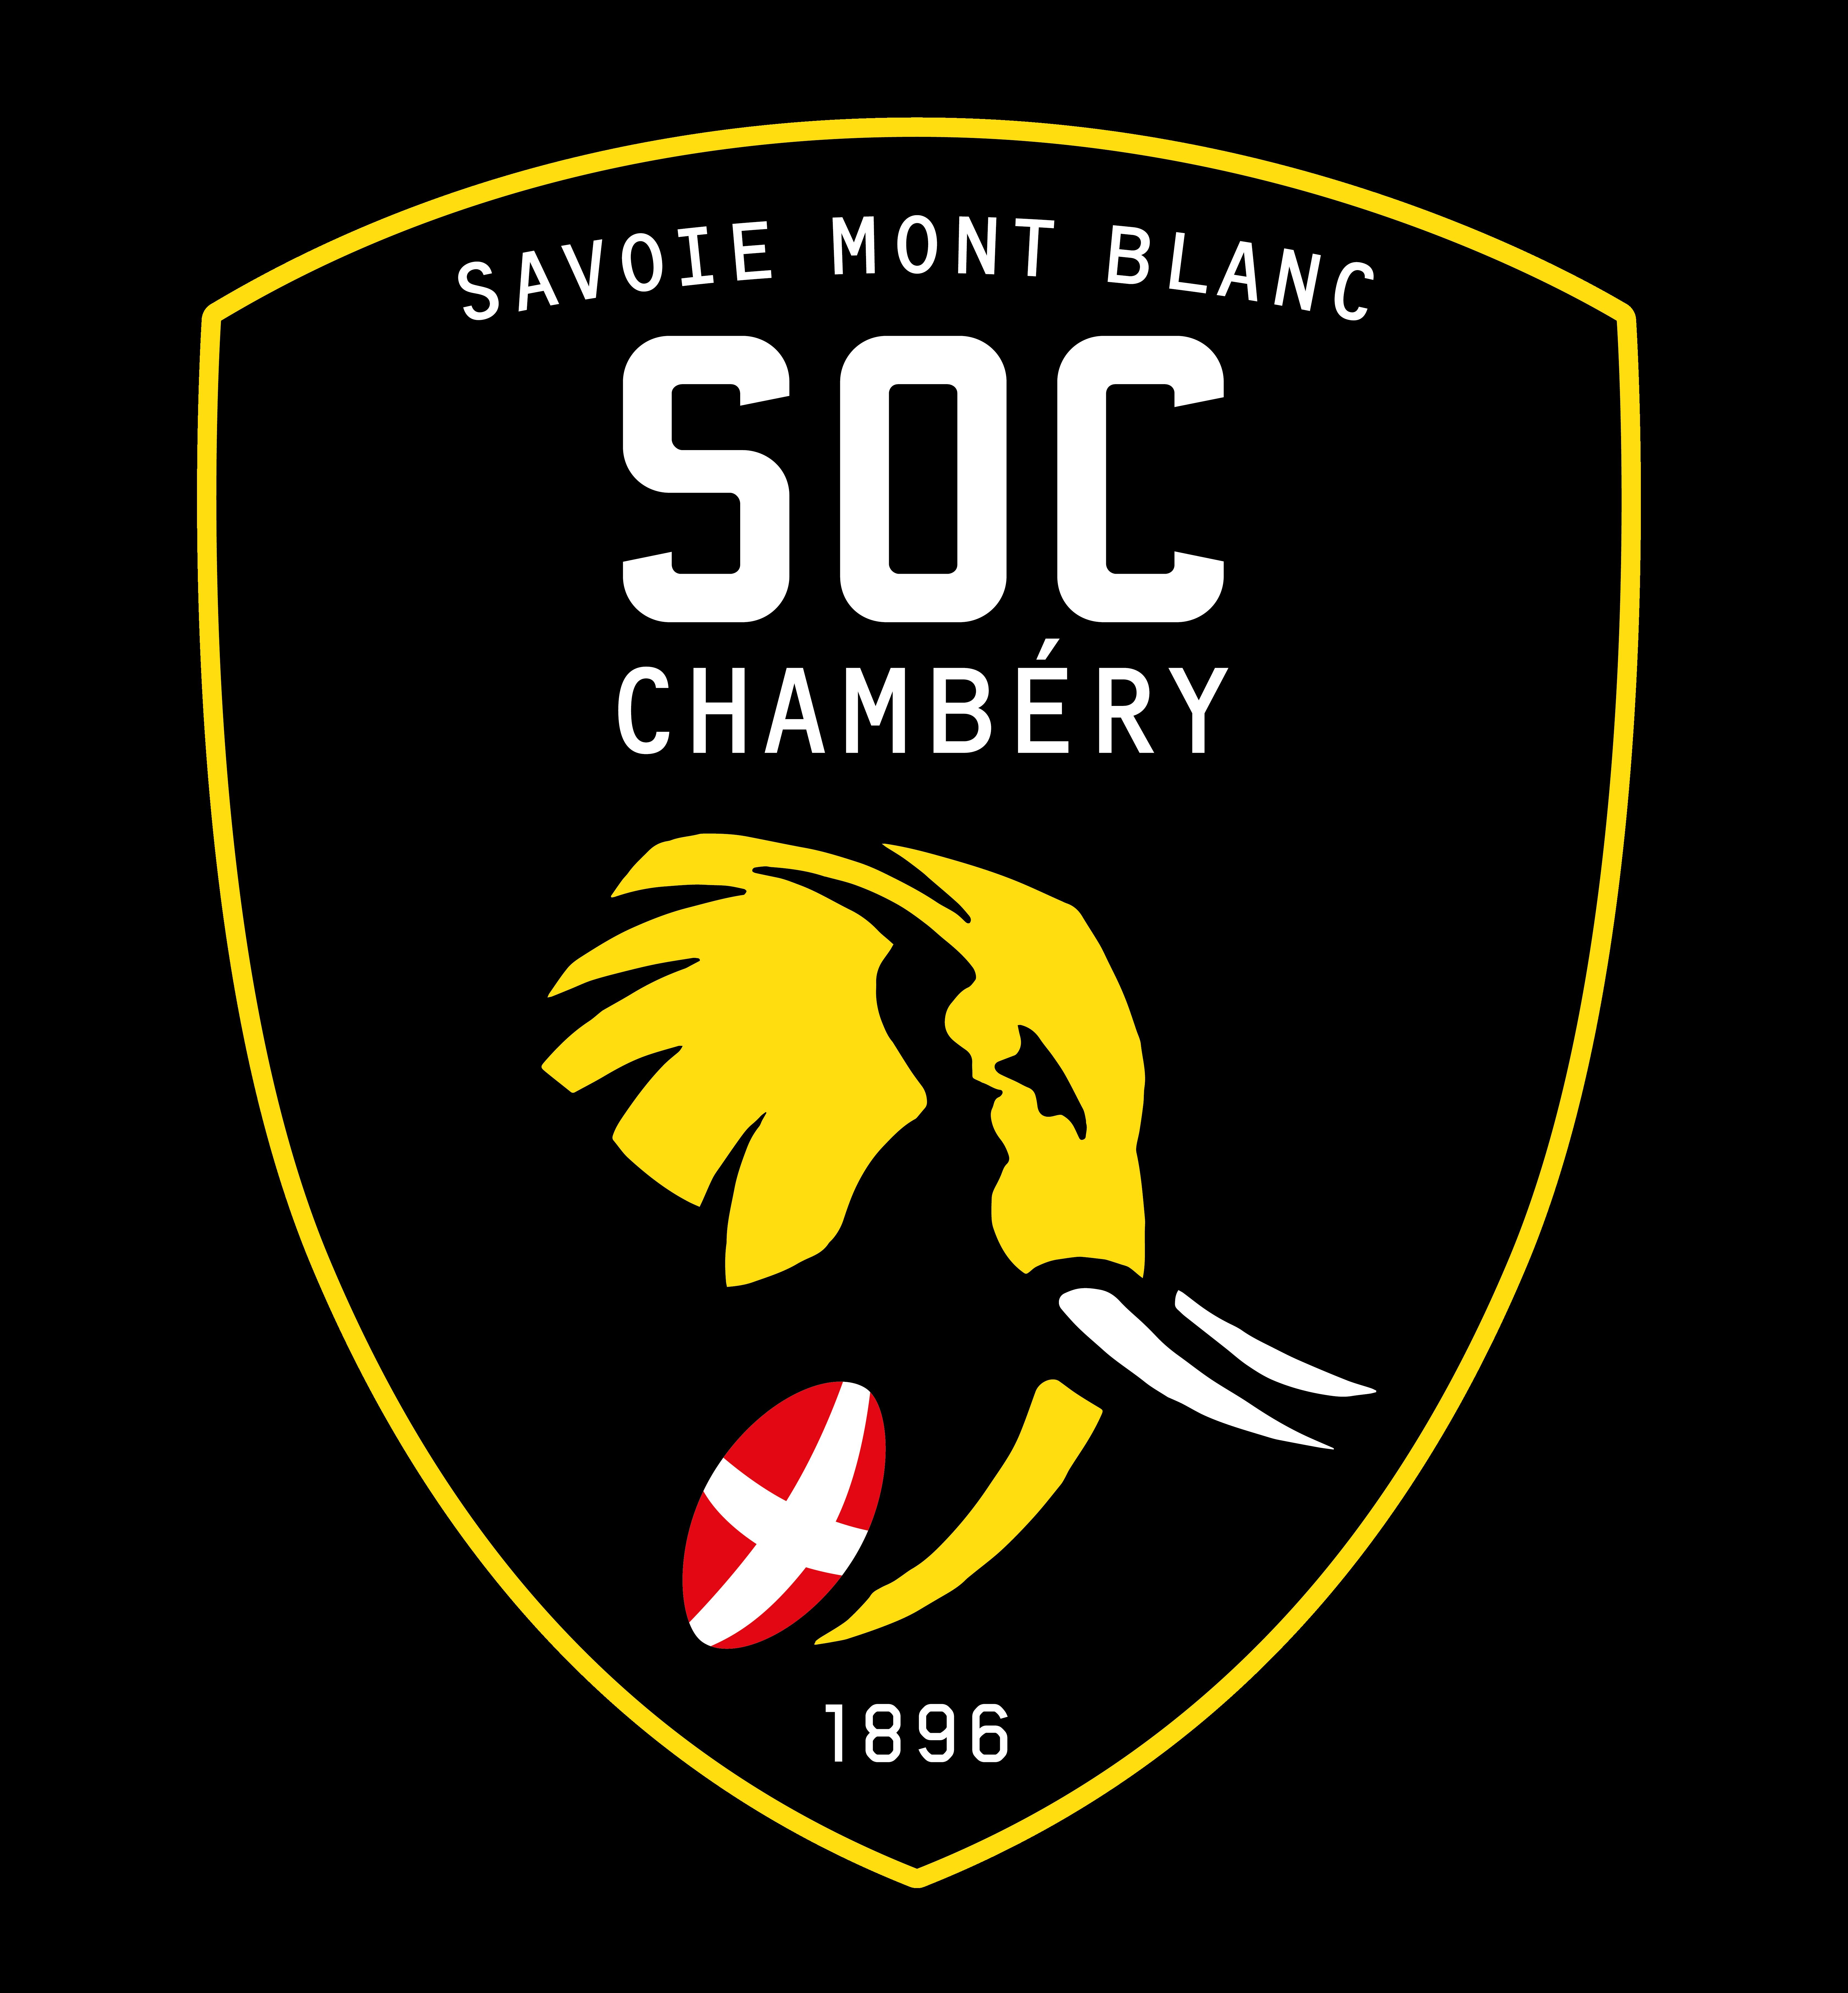 SOC CHAMBERY